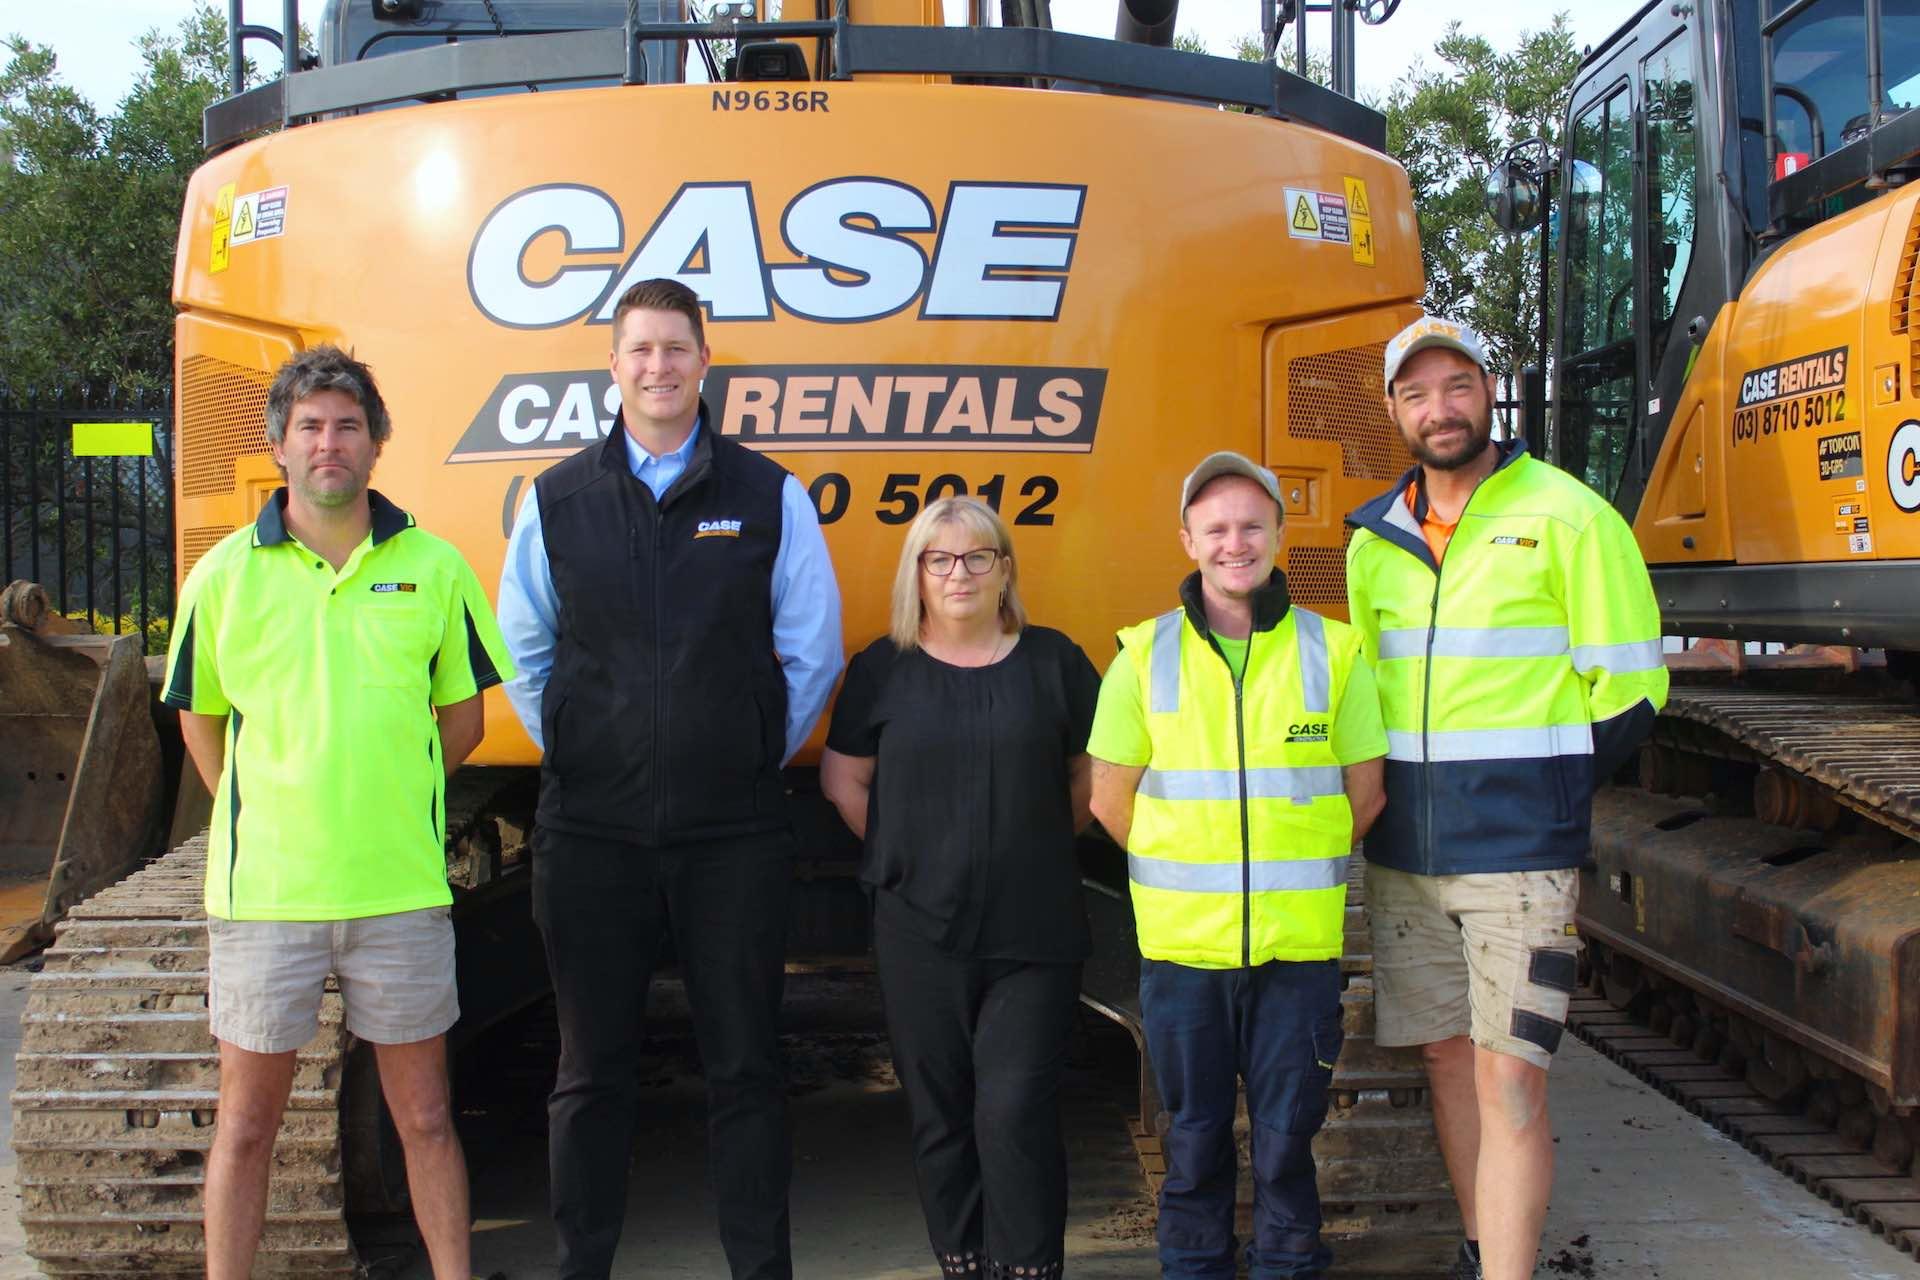 Case Vic Rental Team